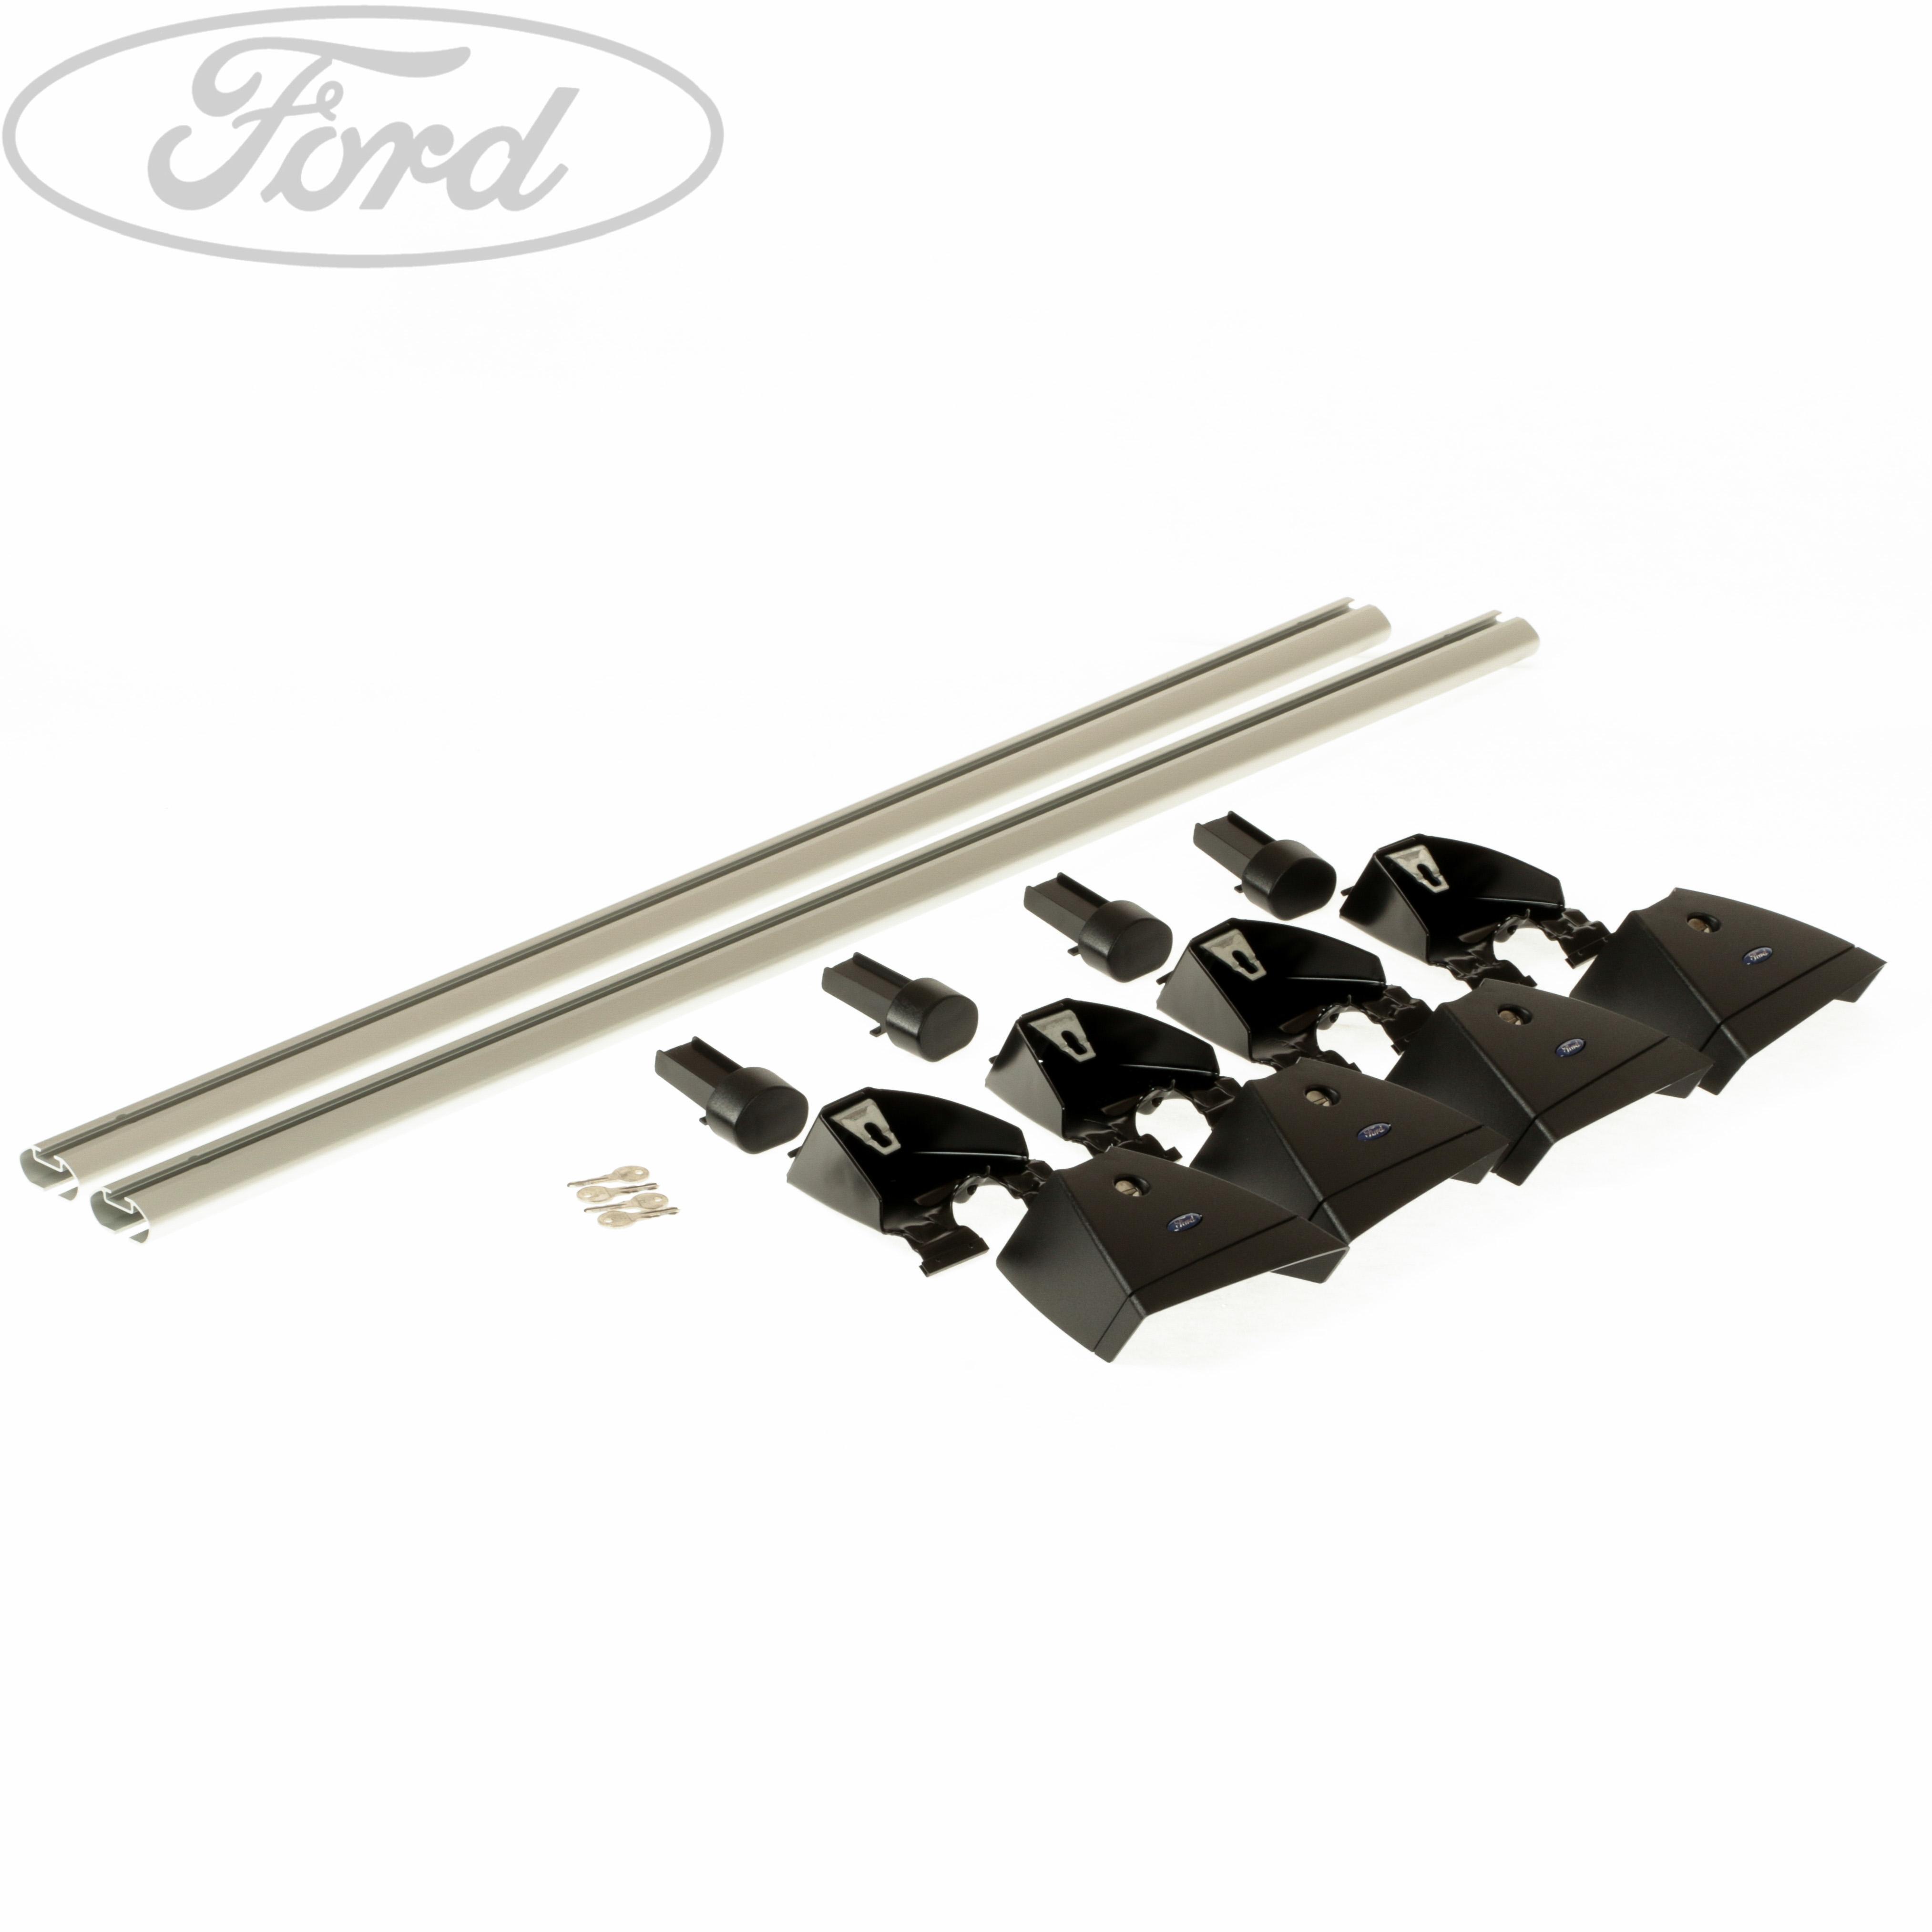 genuine ford c max cmax roof bar rack rail kit 2003 2012 1724672 ebay. Black Bedroom Furniture Sets. Home Design Ideas